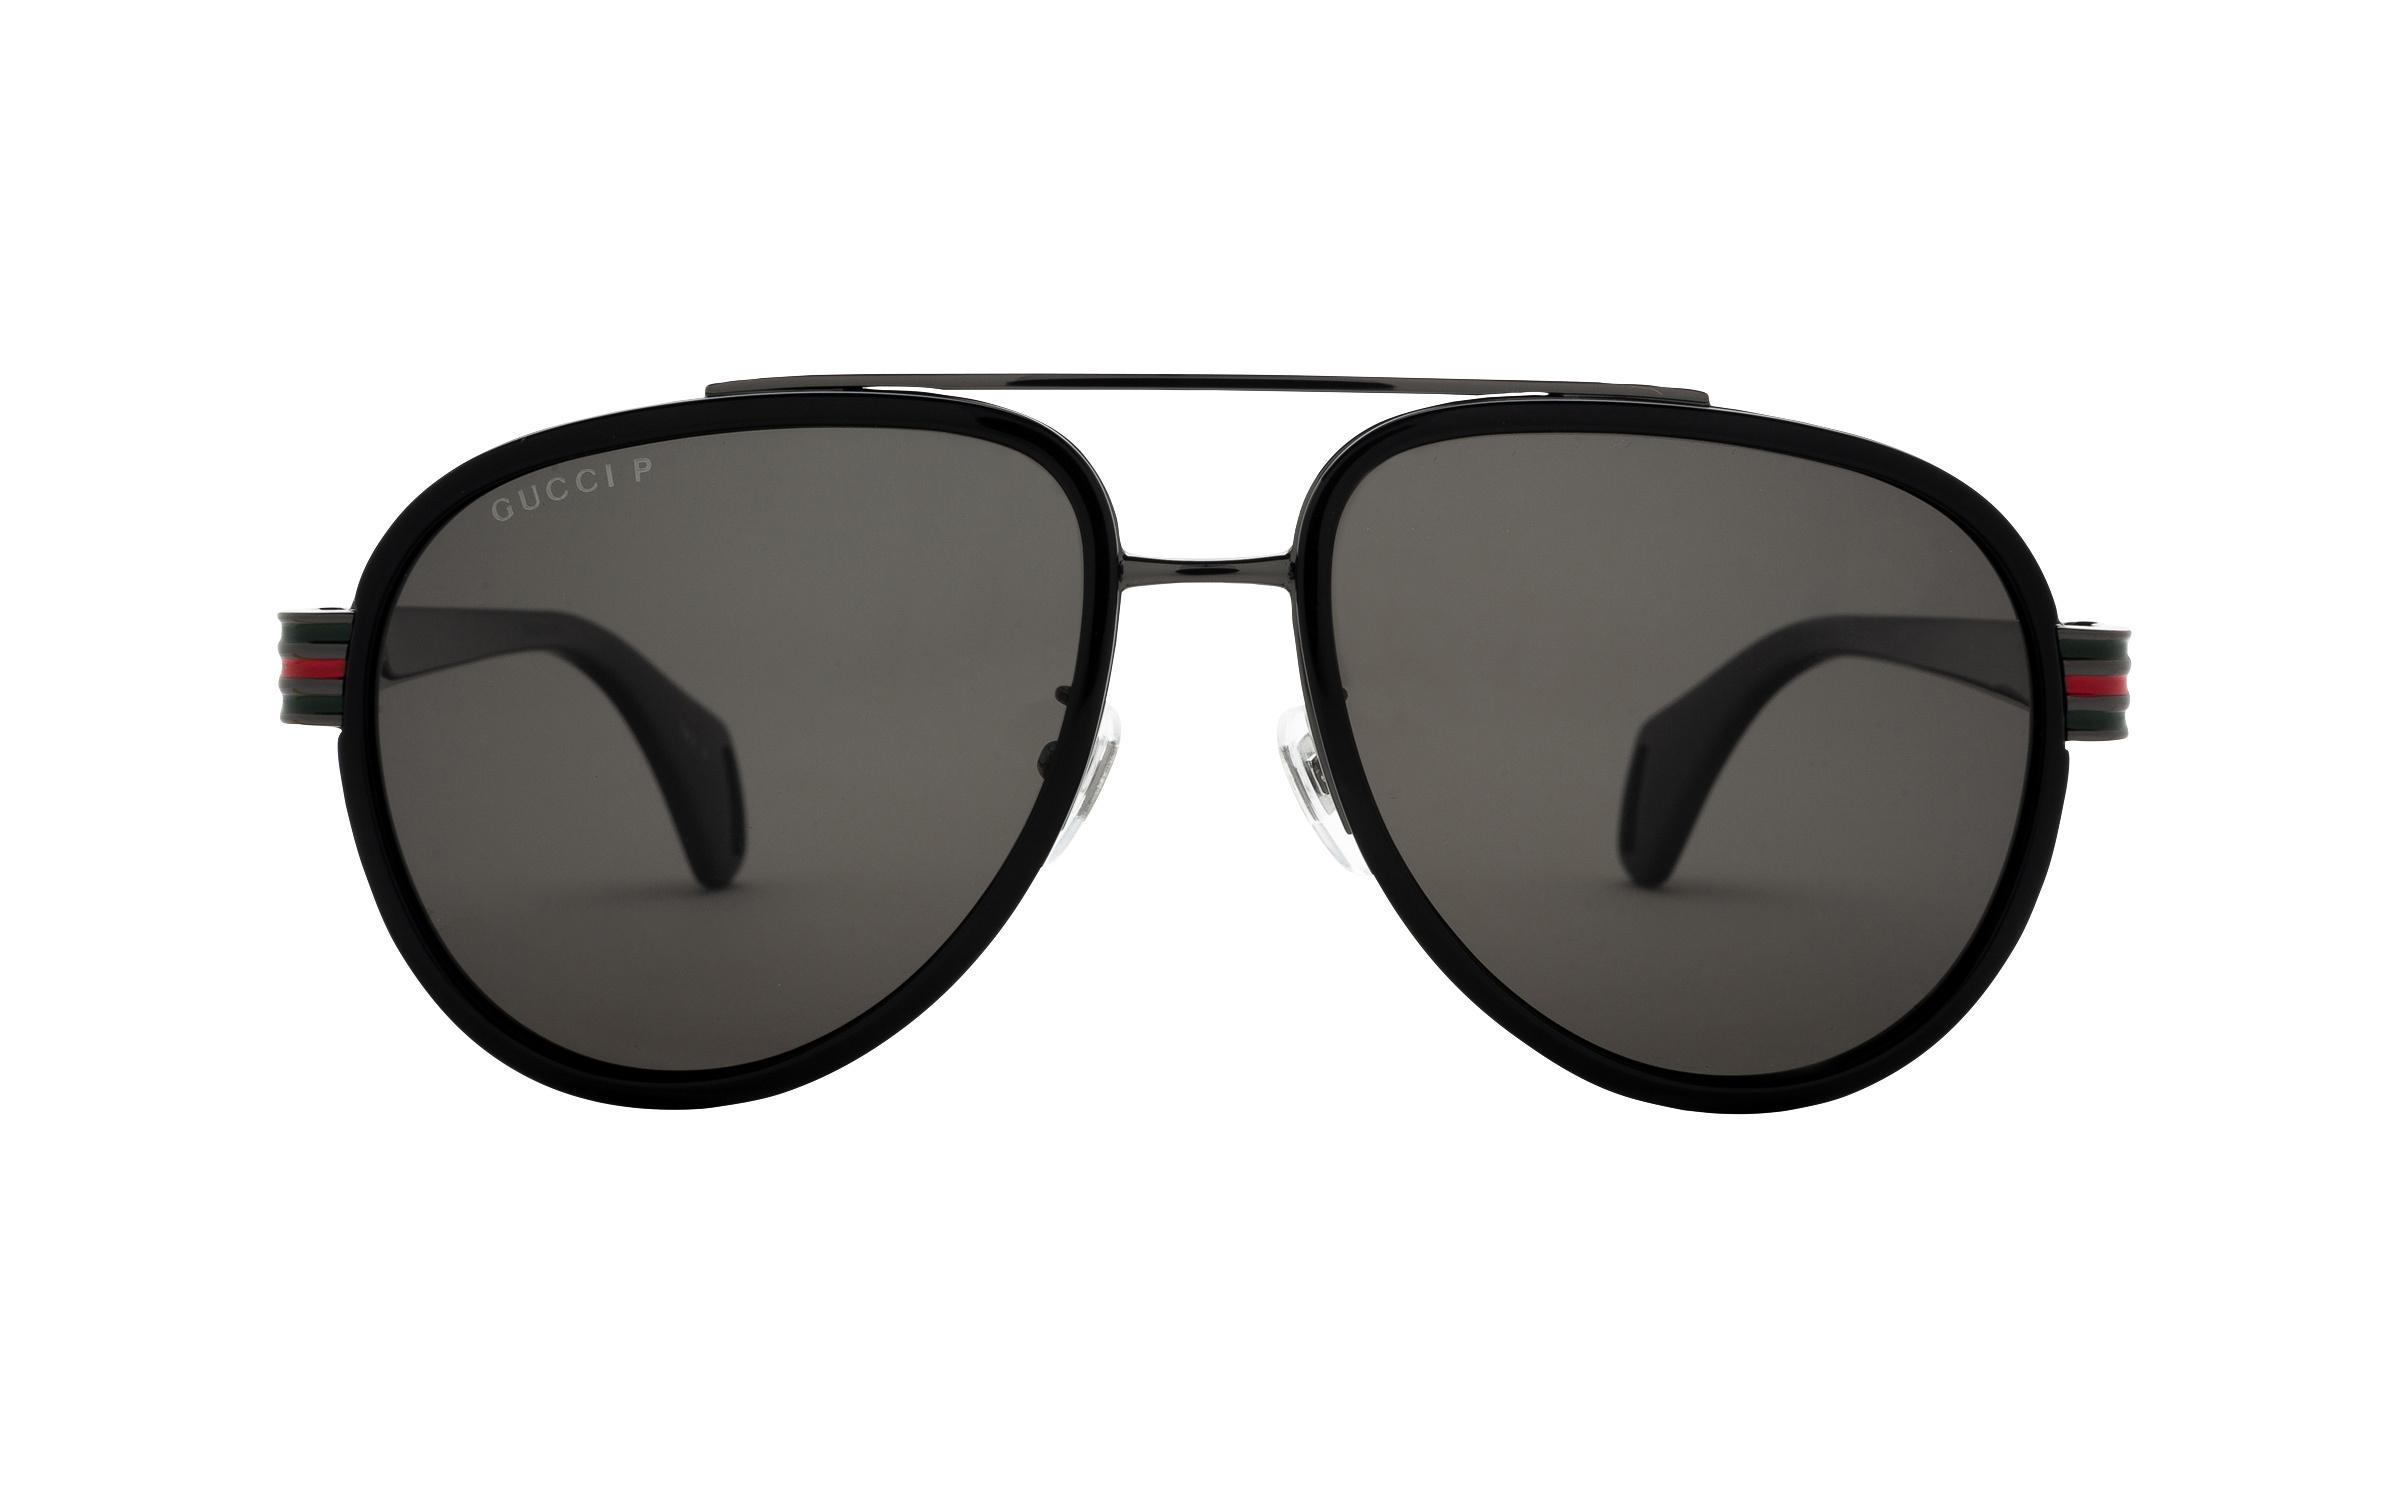 http://www.coastal.com/ - Gucci GG0447S 001 58 Sunglasses in Black – Online Coastal